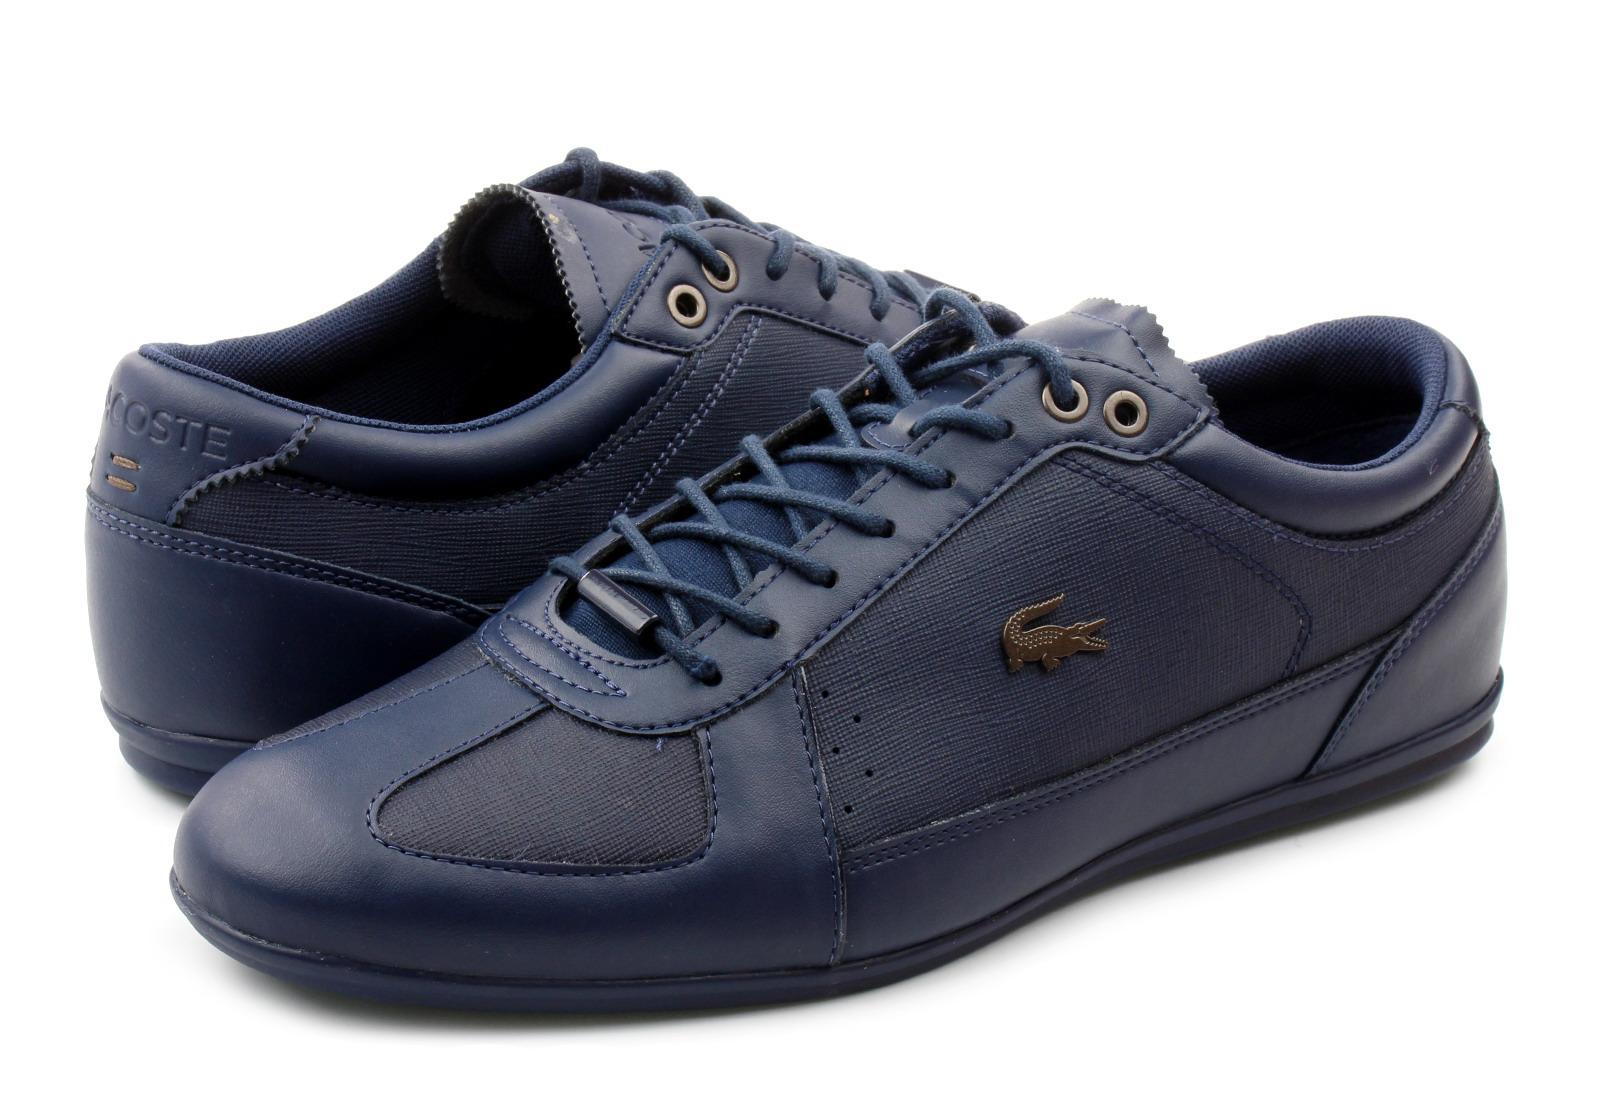 Lacoste Cipő - Evara - 183CAM0023-95K - Office Shoes Magyarország f2b57289a4